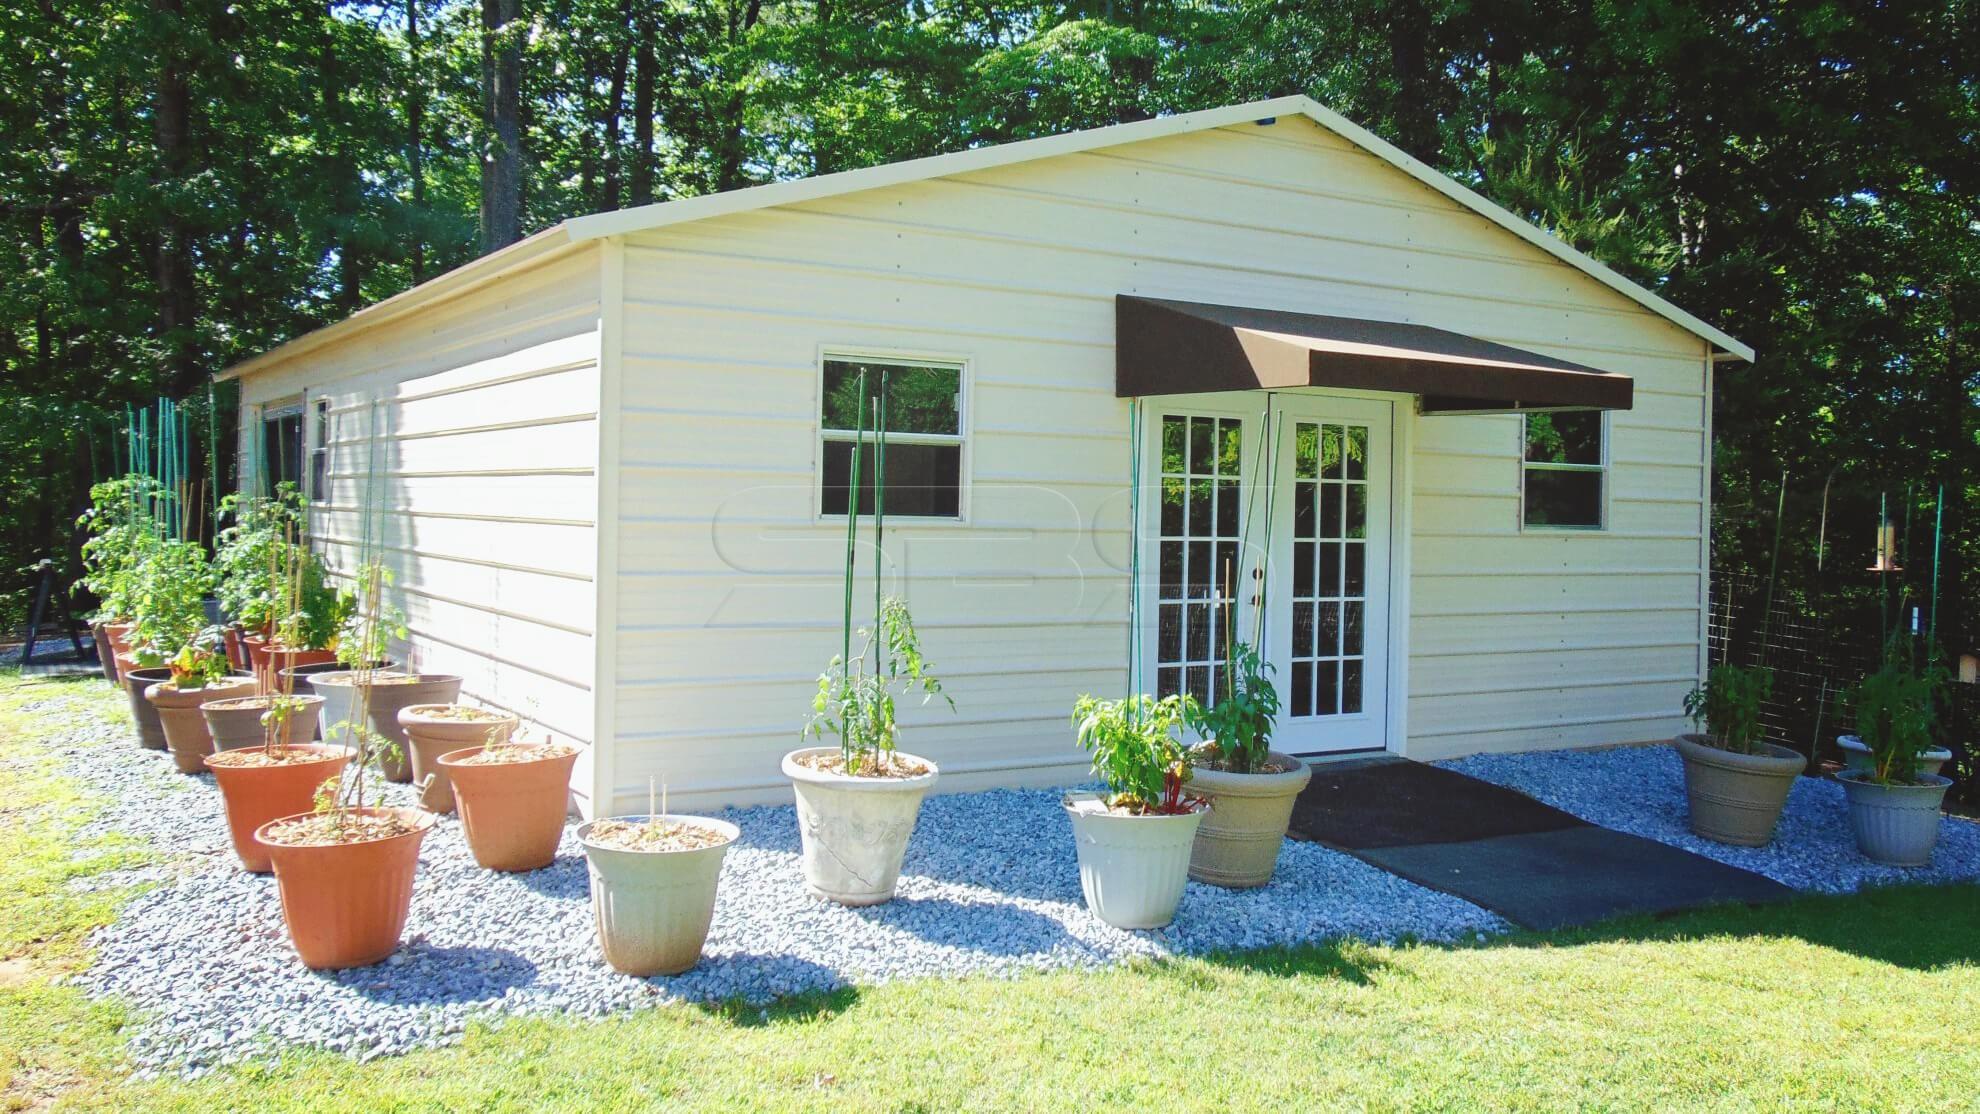 24x36 Metal Garage Home